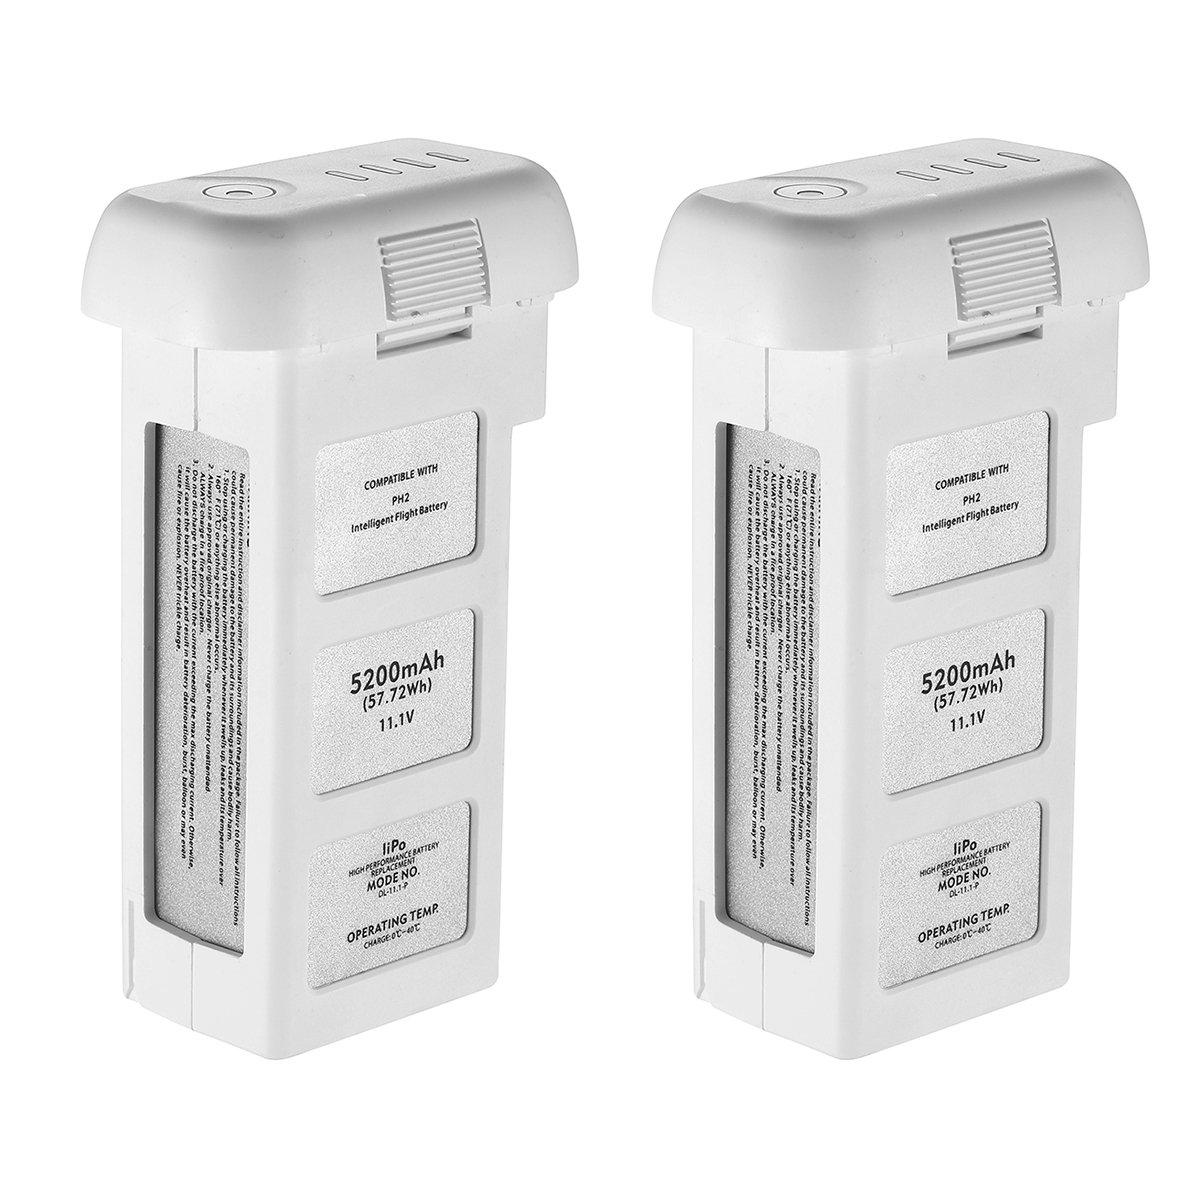 Powerextra 2-Pack 11.1V 5200 mAh LiPo Intelligent Battery Repleacement for DJI Phantom 2, Phantom 2 Vision and Phantom 2 Vision Plus - Upgraded